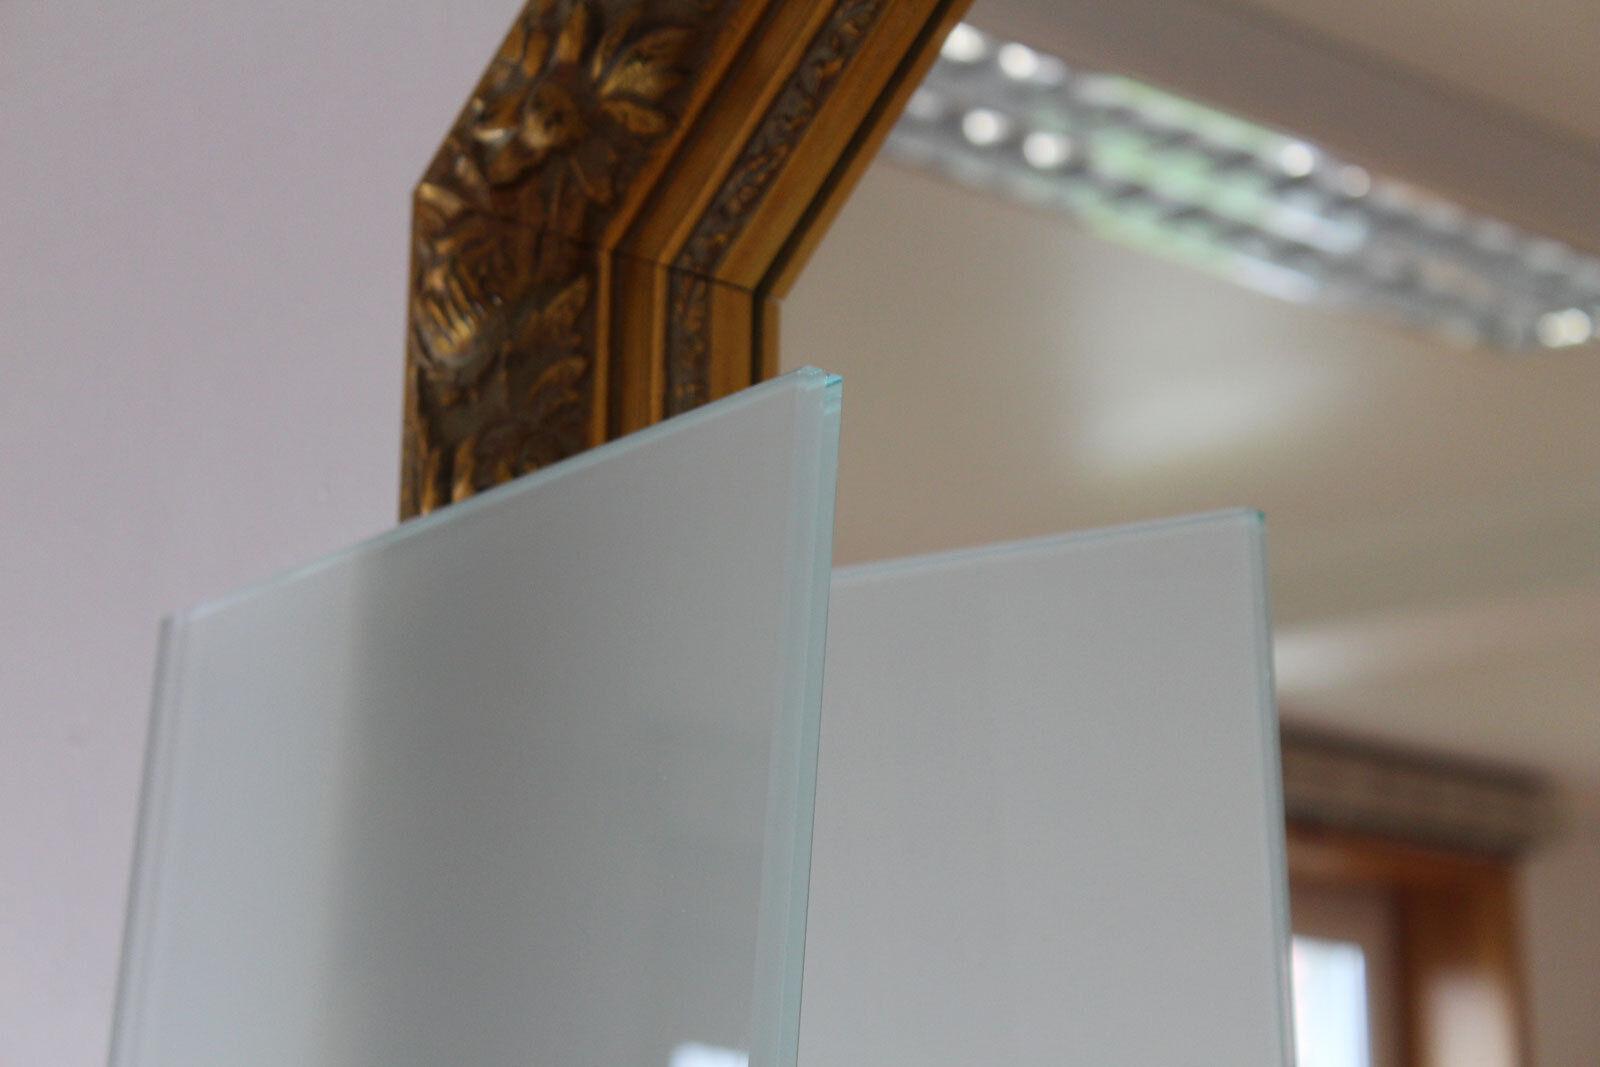 br stungsglas vsg tvg matt 8mm 0 76mm gel nderglas glas sicherheitsglas eur 74 90 picclick de. Black Bedroom Furniture Sets. Home Design Ideas